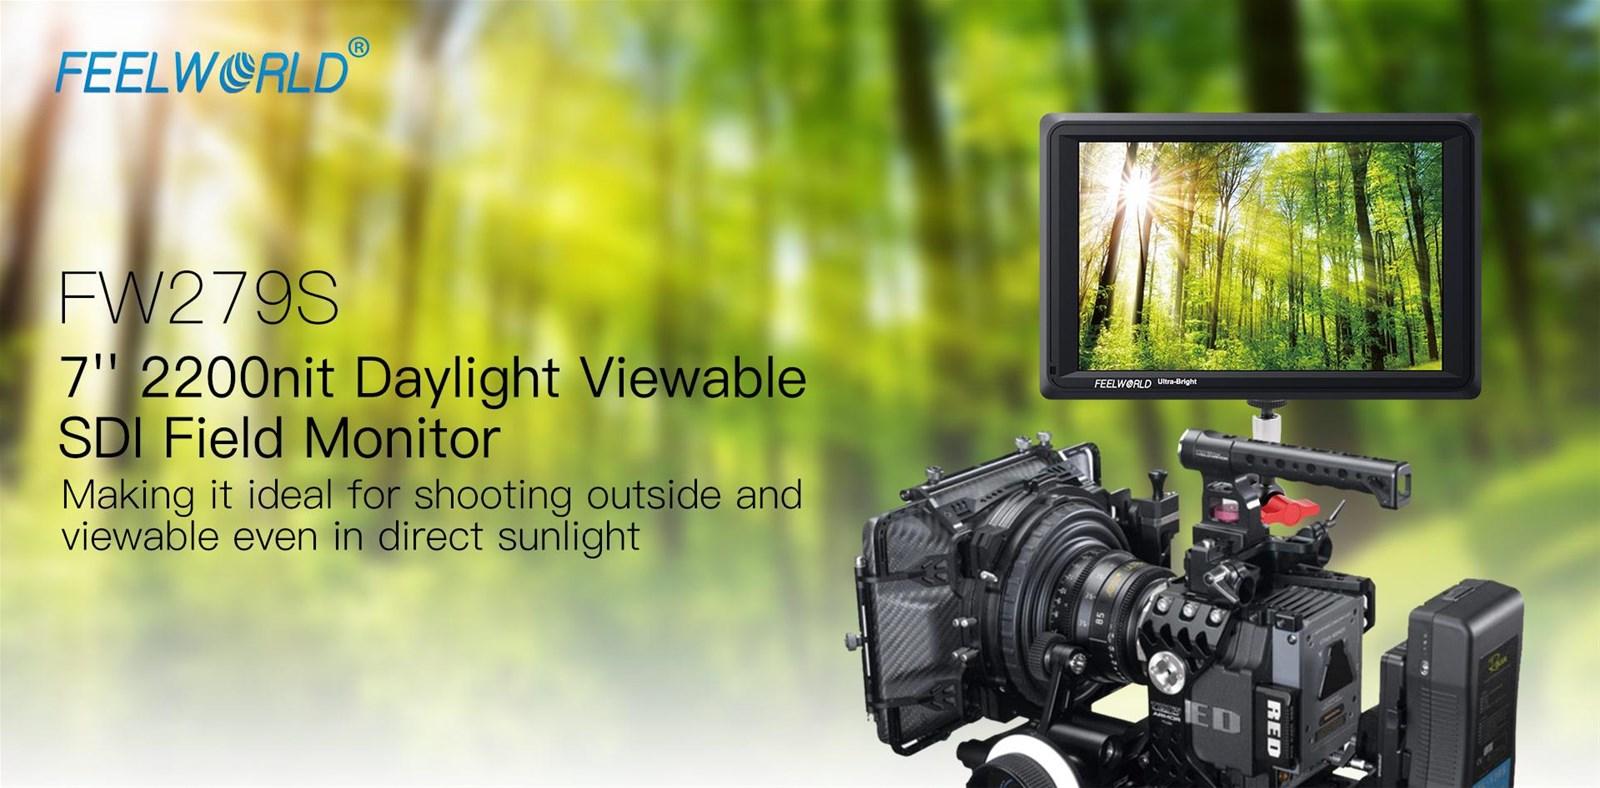 FEELWORLD FW279S 7 Inch 2200nit Daylight Viewable Camera Field Monitor 3GSDI 4K HDMI Input Output 1920X1200 IPS Panel